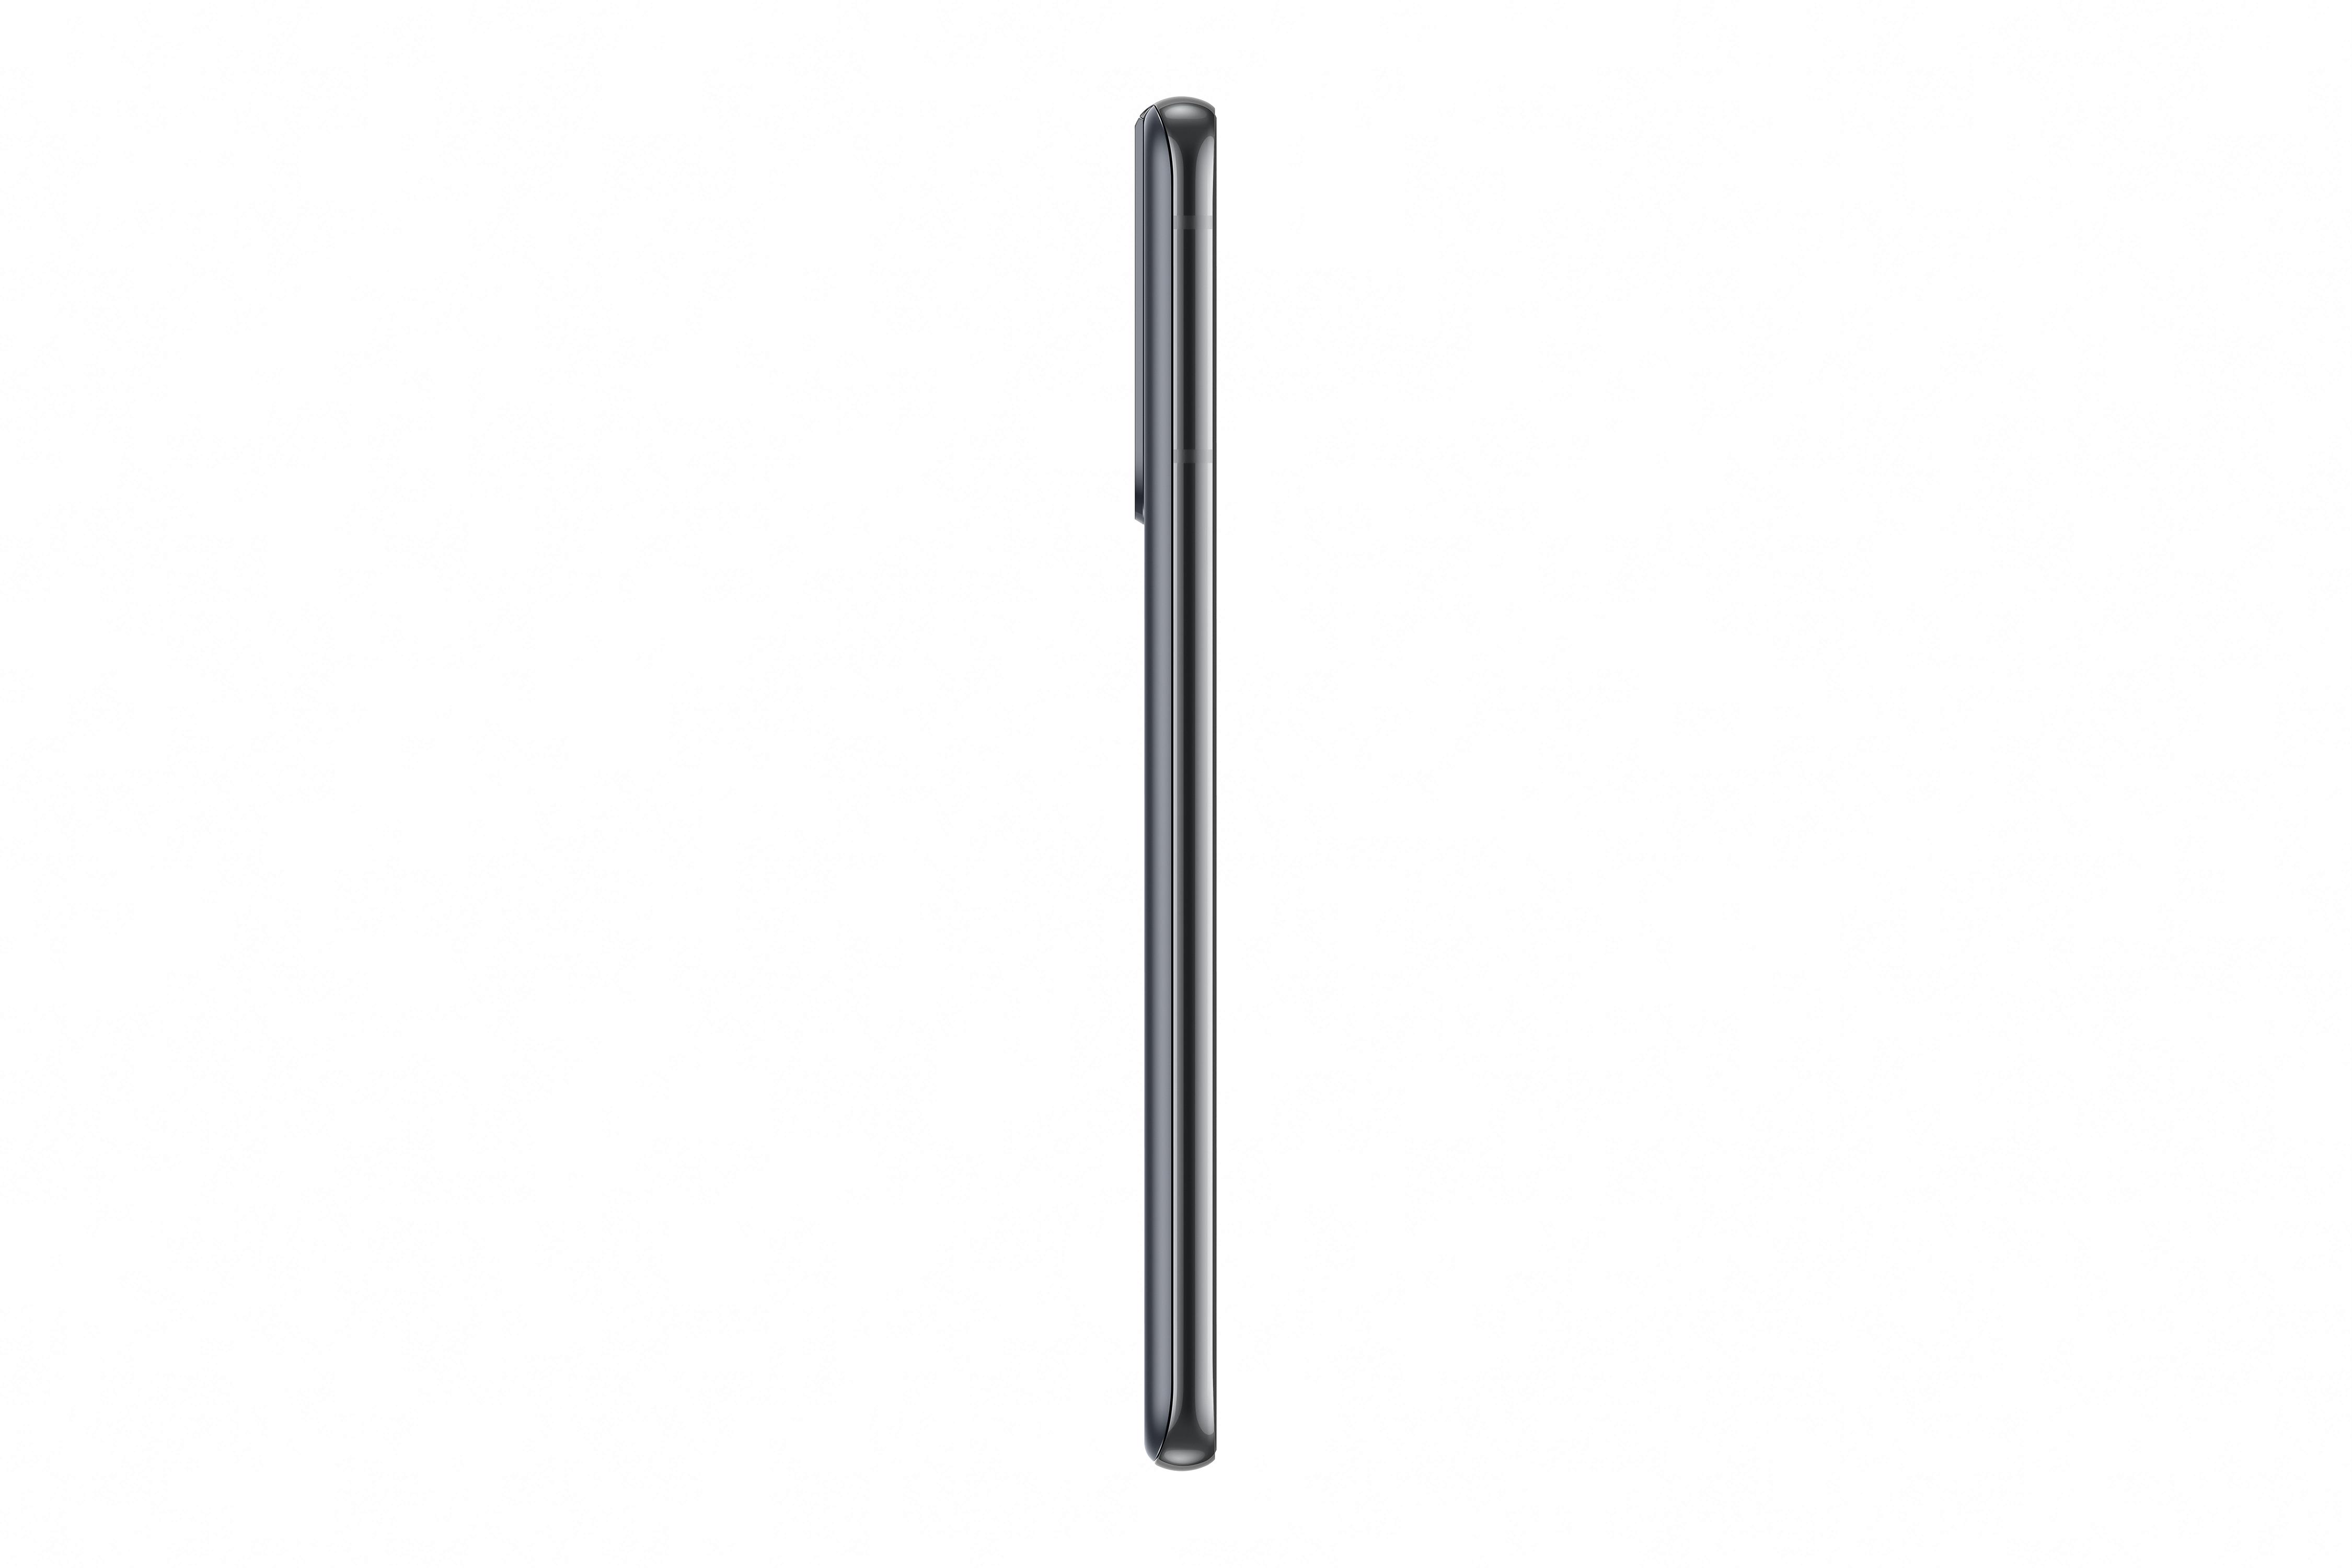 Samsung Galaxy S21 DUAL (SM-G991B) Gray - 5